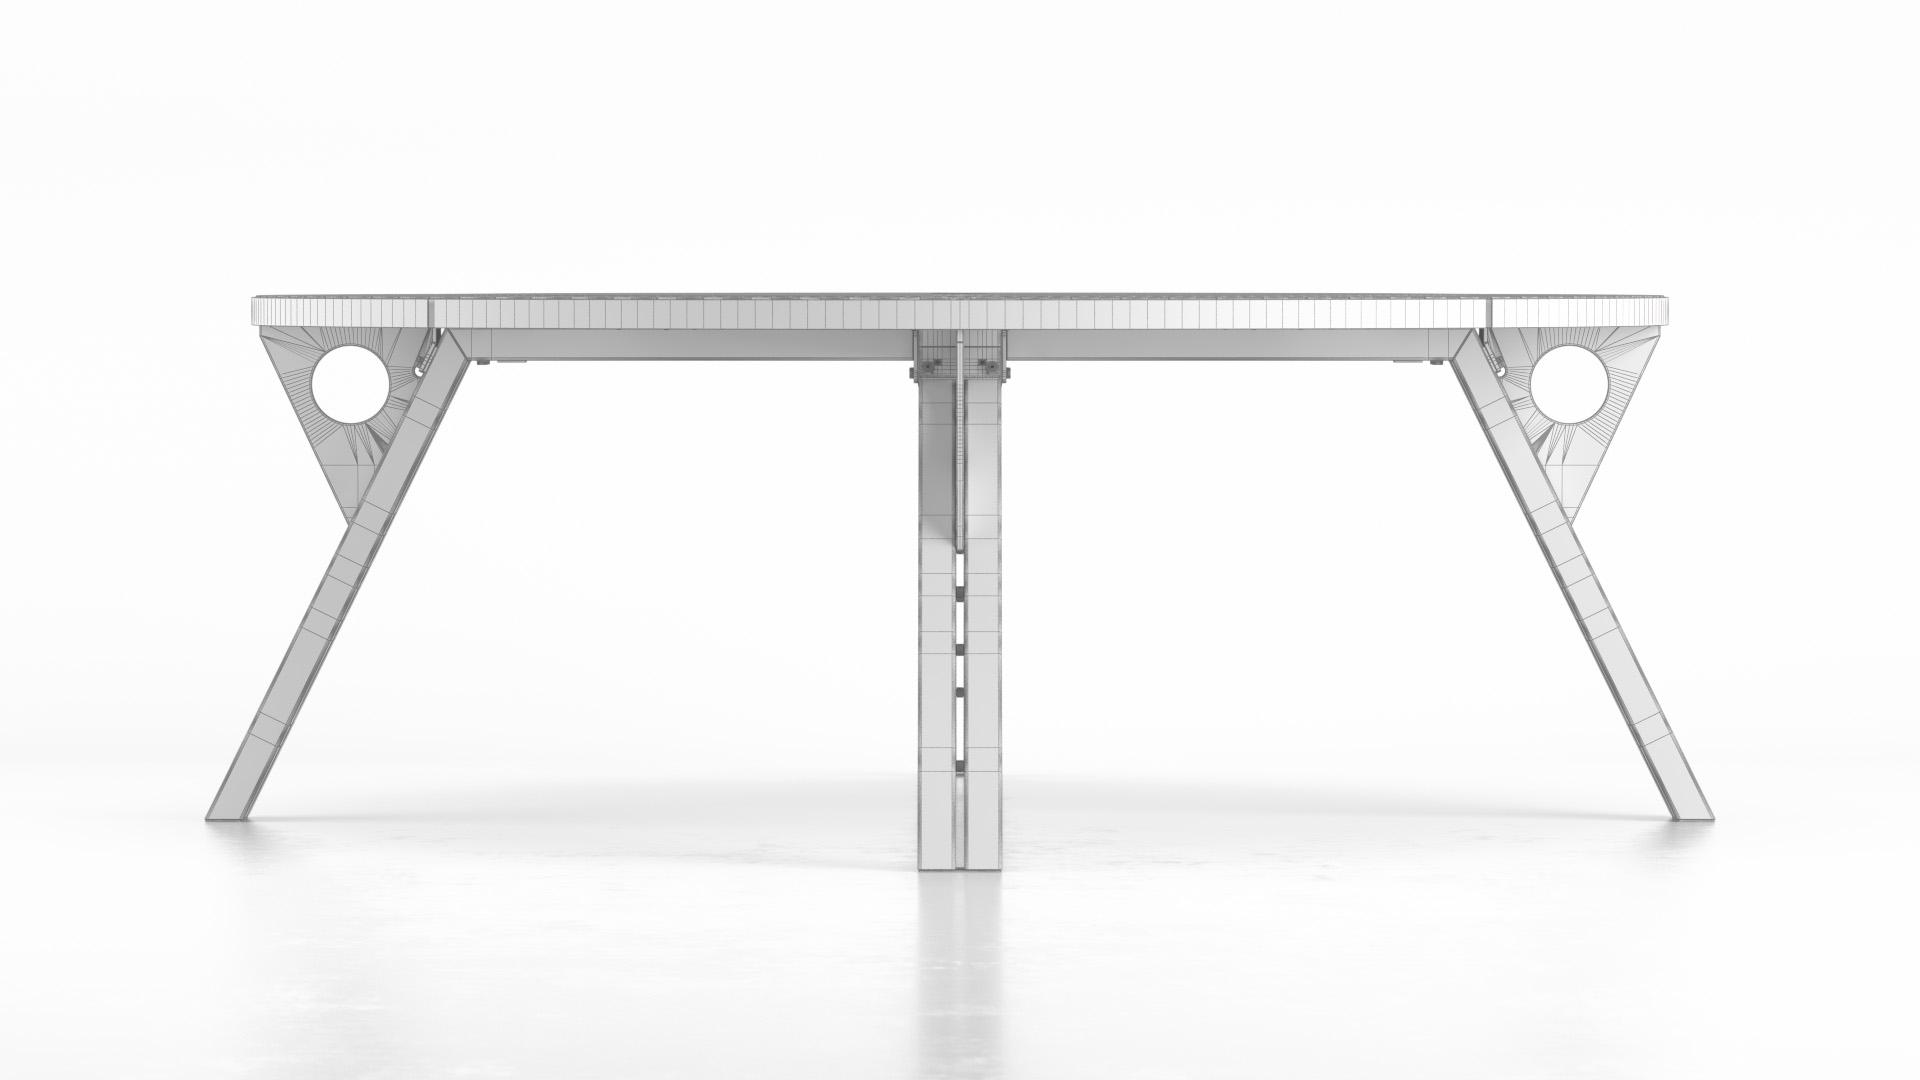 Gargantua_Table_Mode2_WhiteSet_01_wire_0001